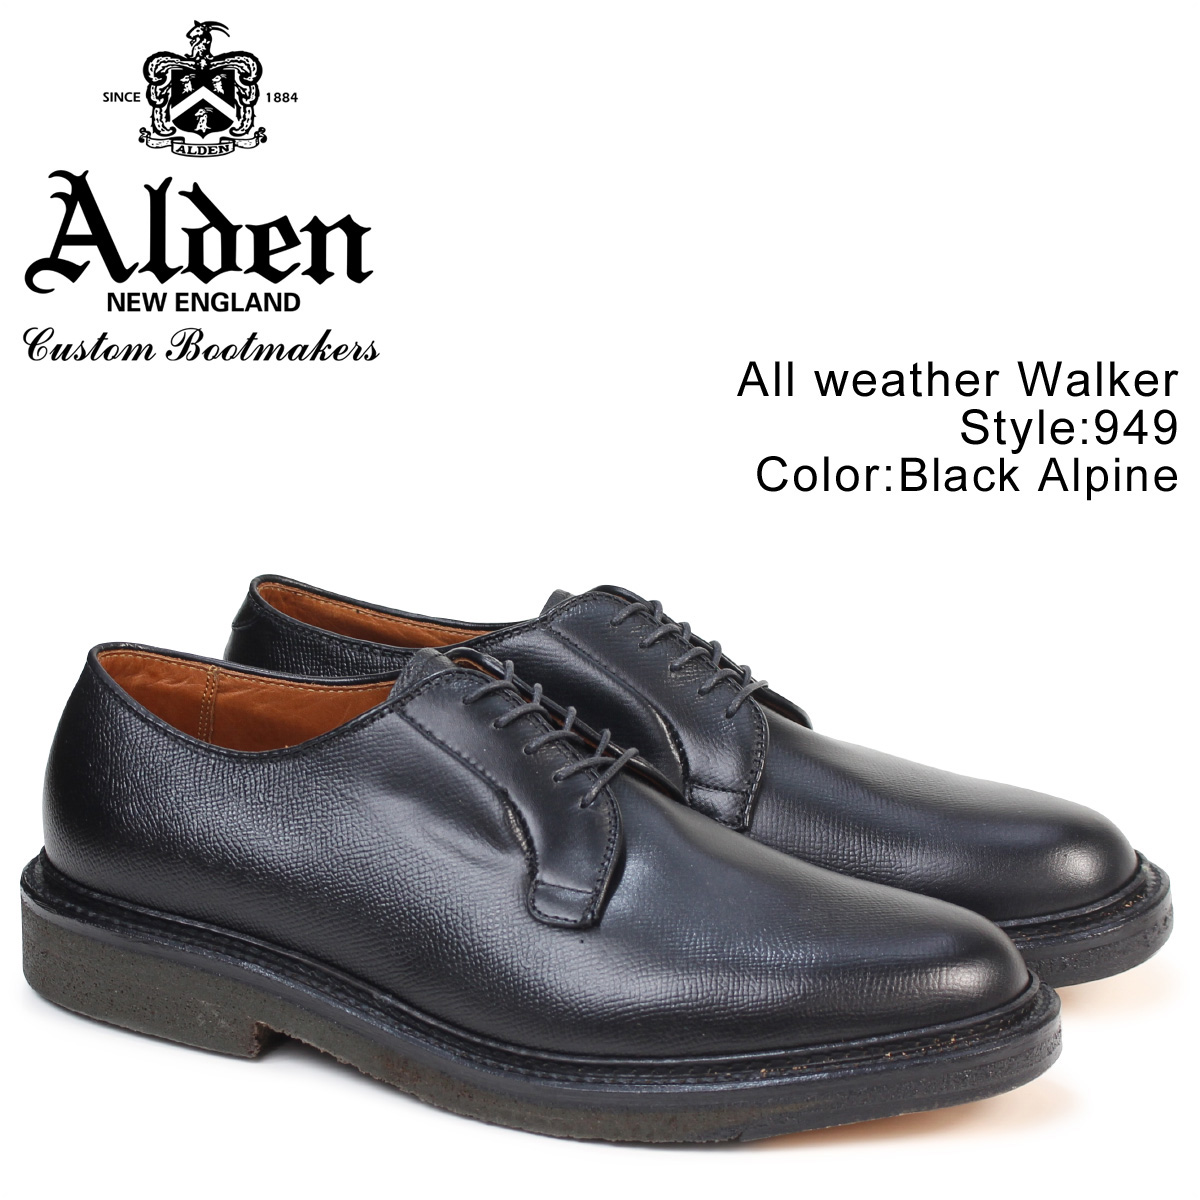 ALDEN ALL WEATHER WALKER オールデン シューズ メンズ Dワイズ 949